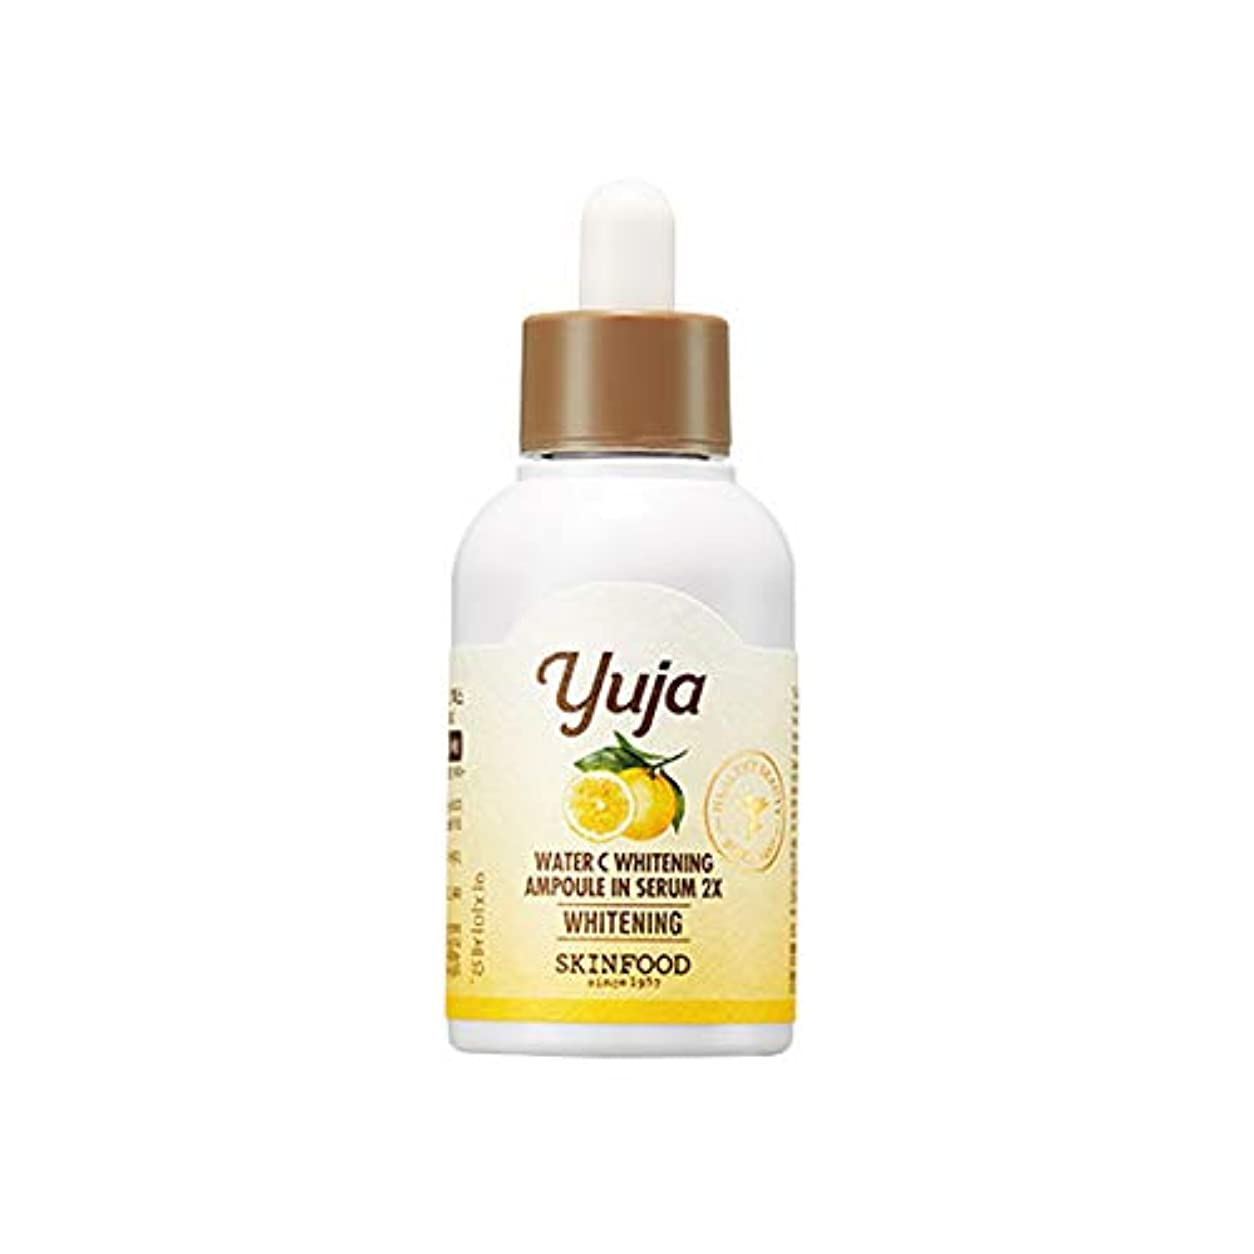 転倒複合文明化Skinfood Yuja Water C Whitening Ampoule In Serum 2X/50ml [並行輸入品]